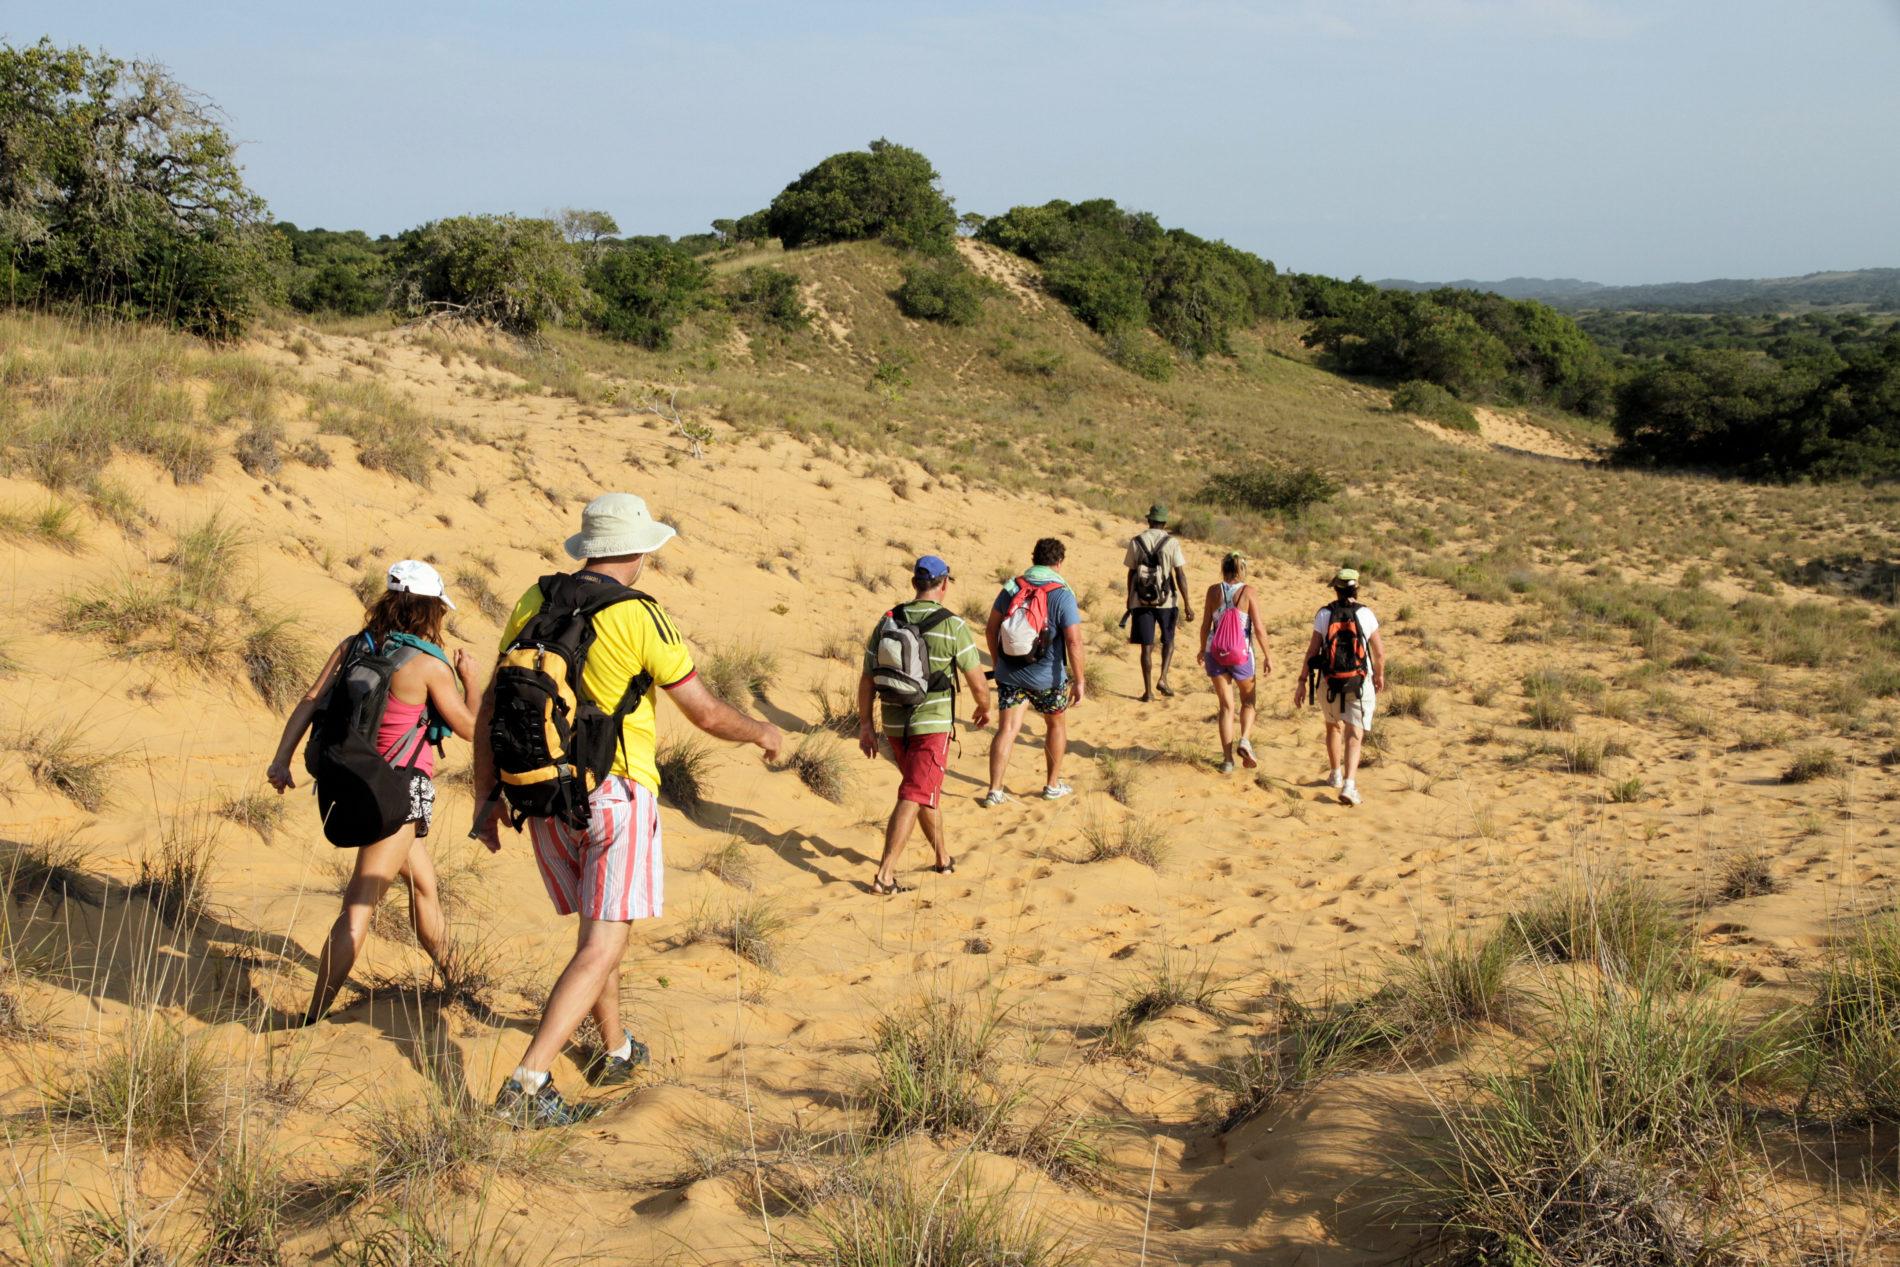 Nature Walks in Kosi Bay at Utshwayelo Lodge